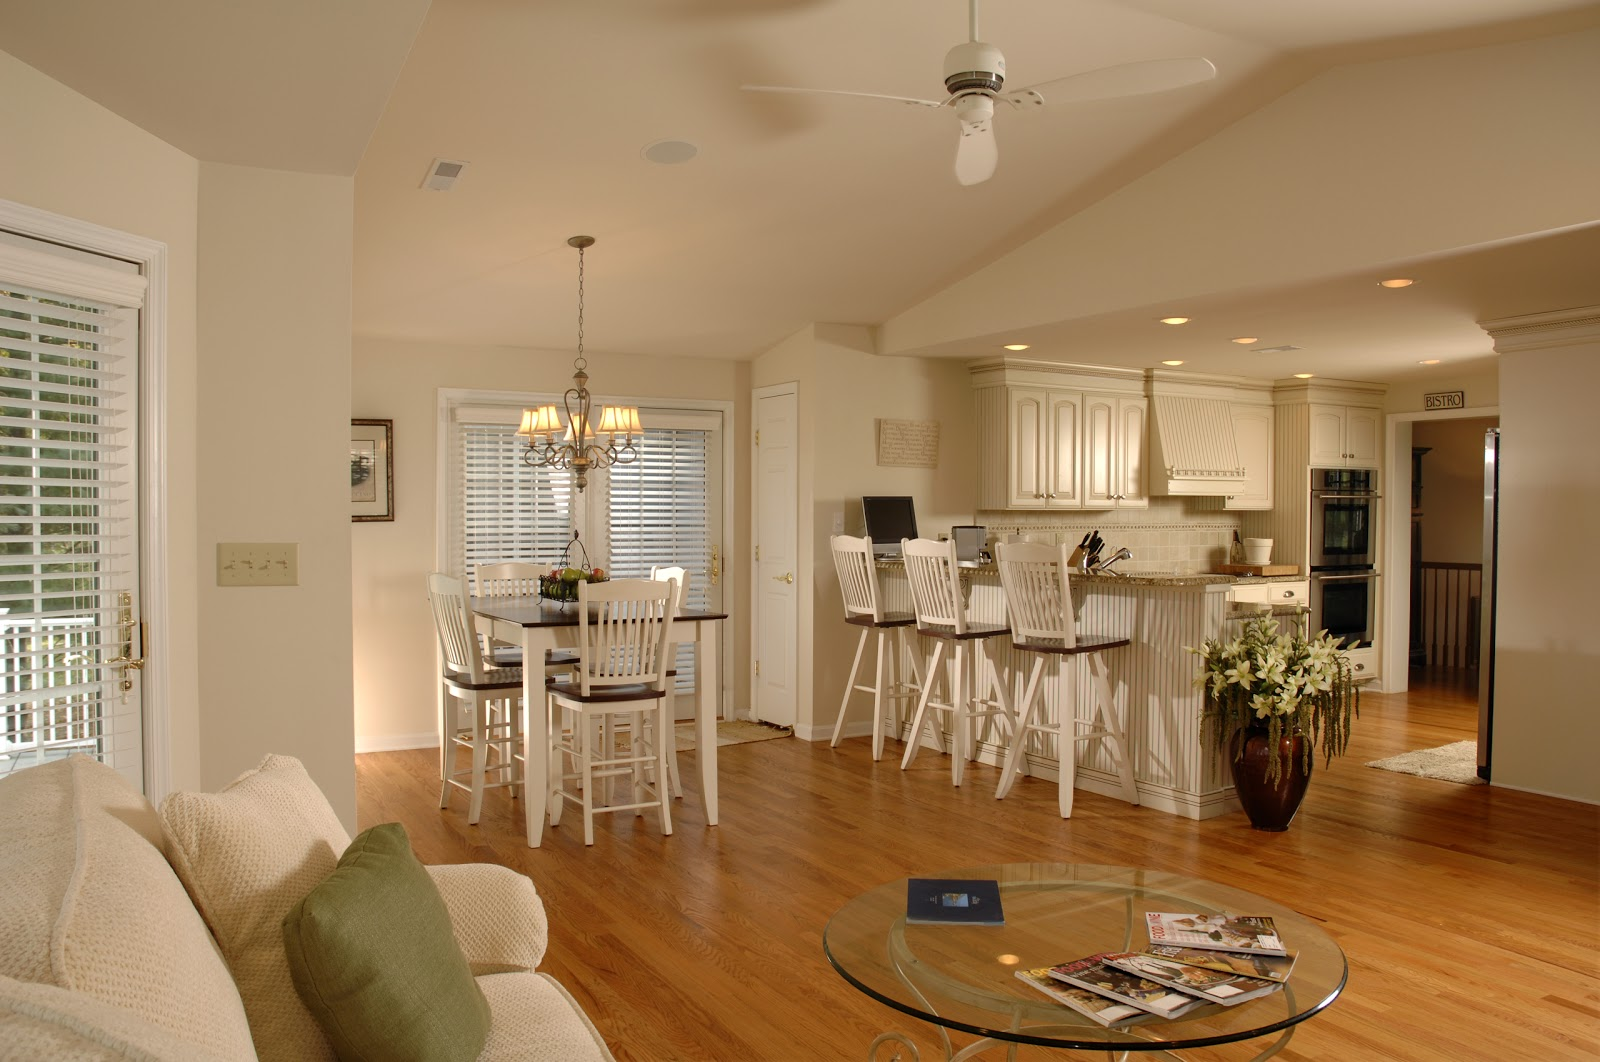 Home Interior Pictures: Kitchen interior design ideas